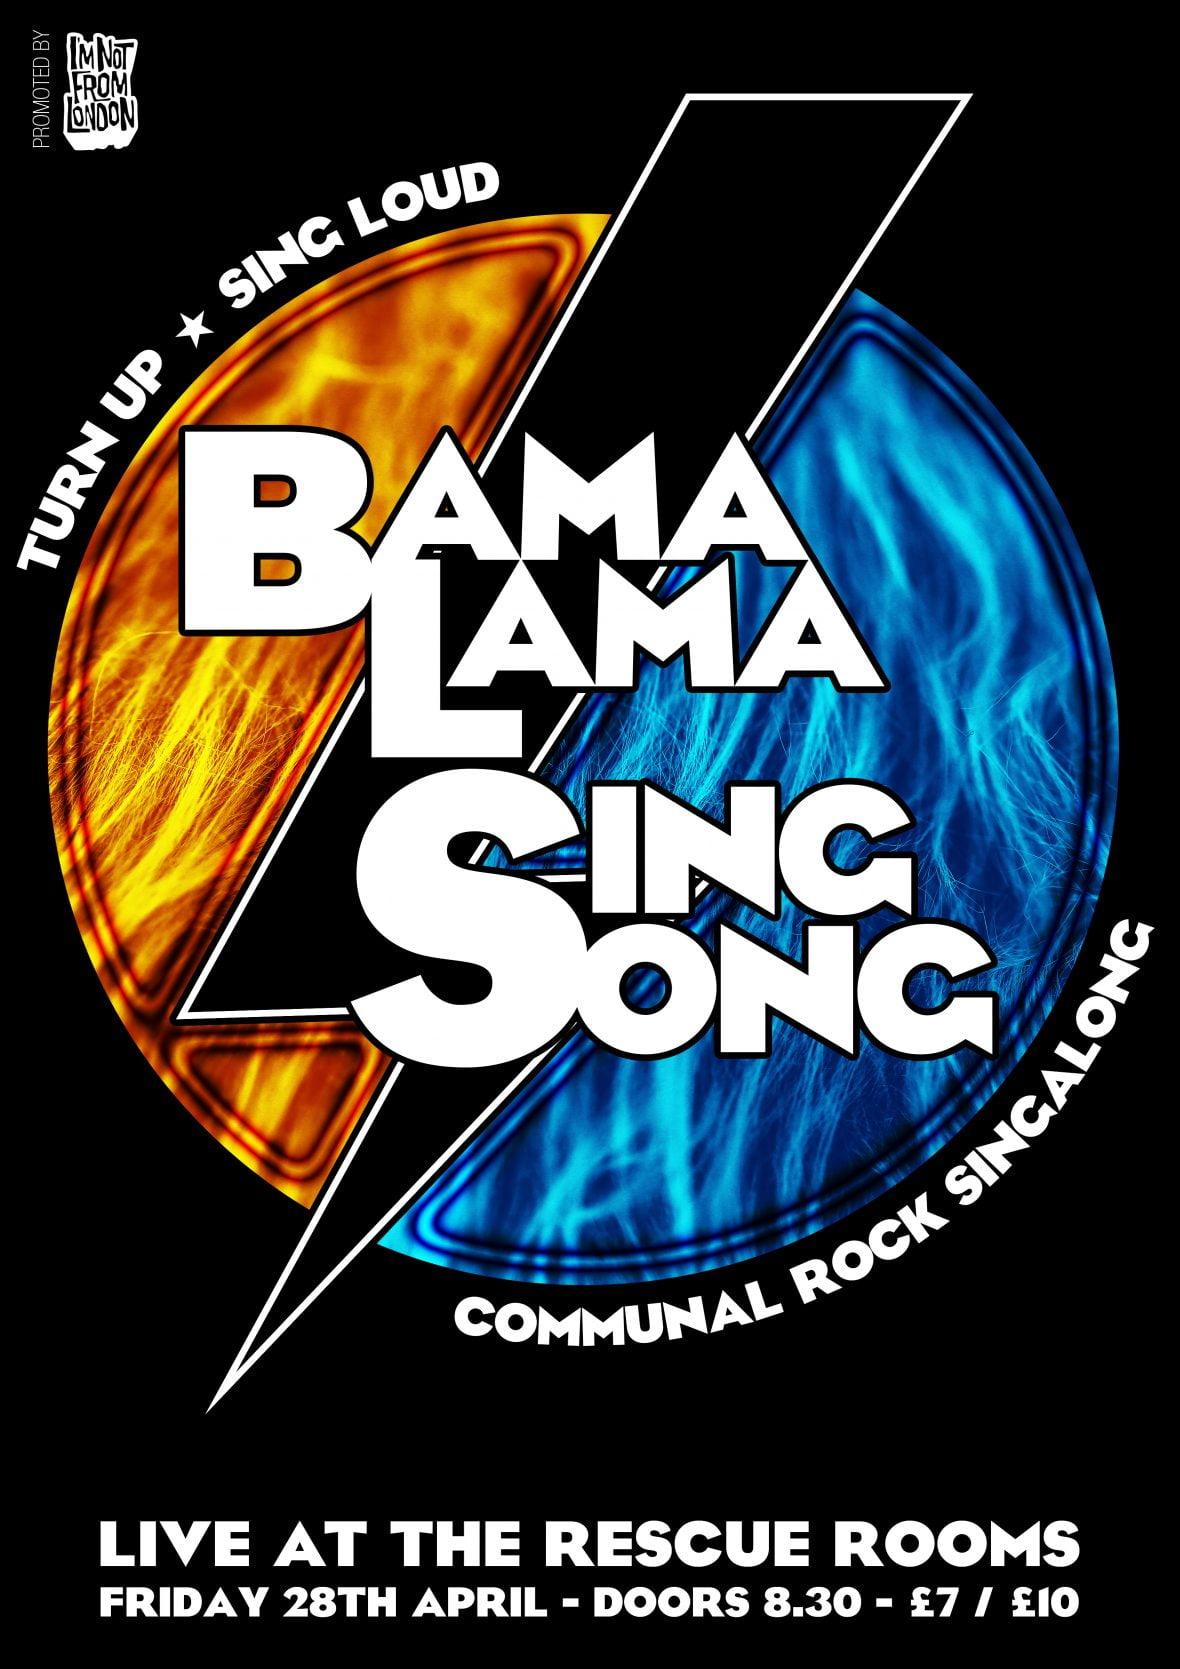 Mass communal rock karaoke!!